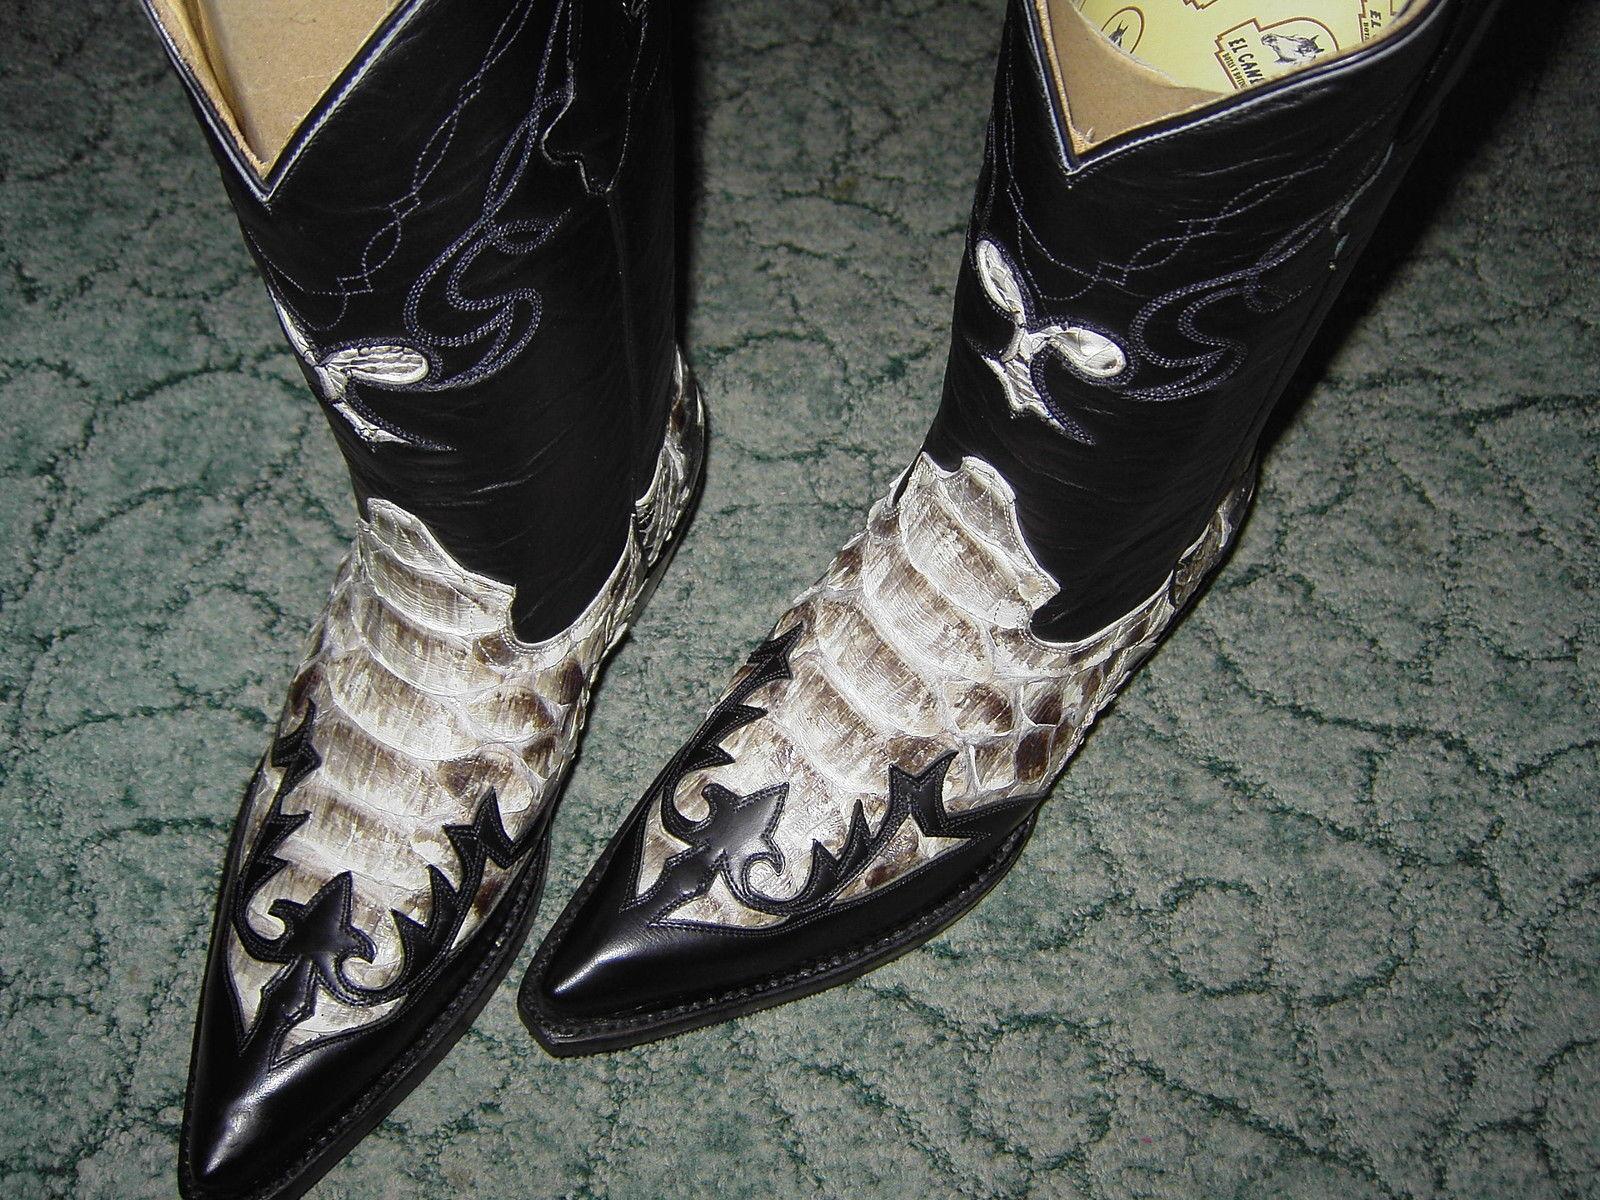 Luxuriöse Pythonleder-Boots im Western-Style -rahmengen. LS -Gr. 36 - rar - Neu!